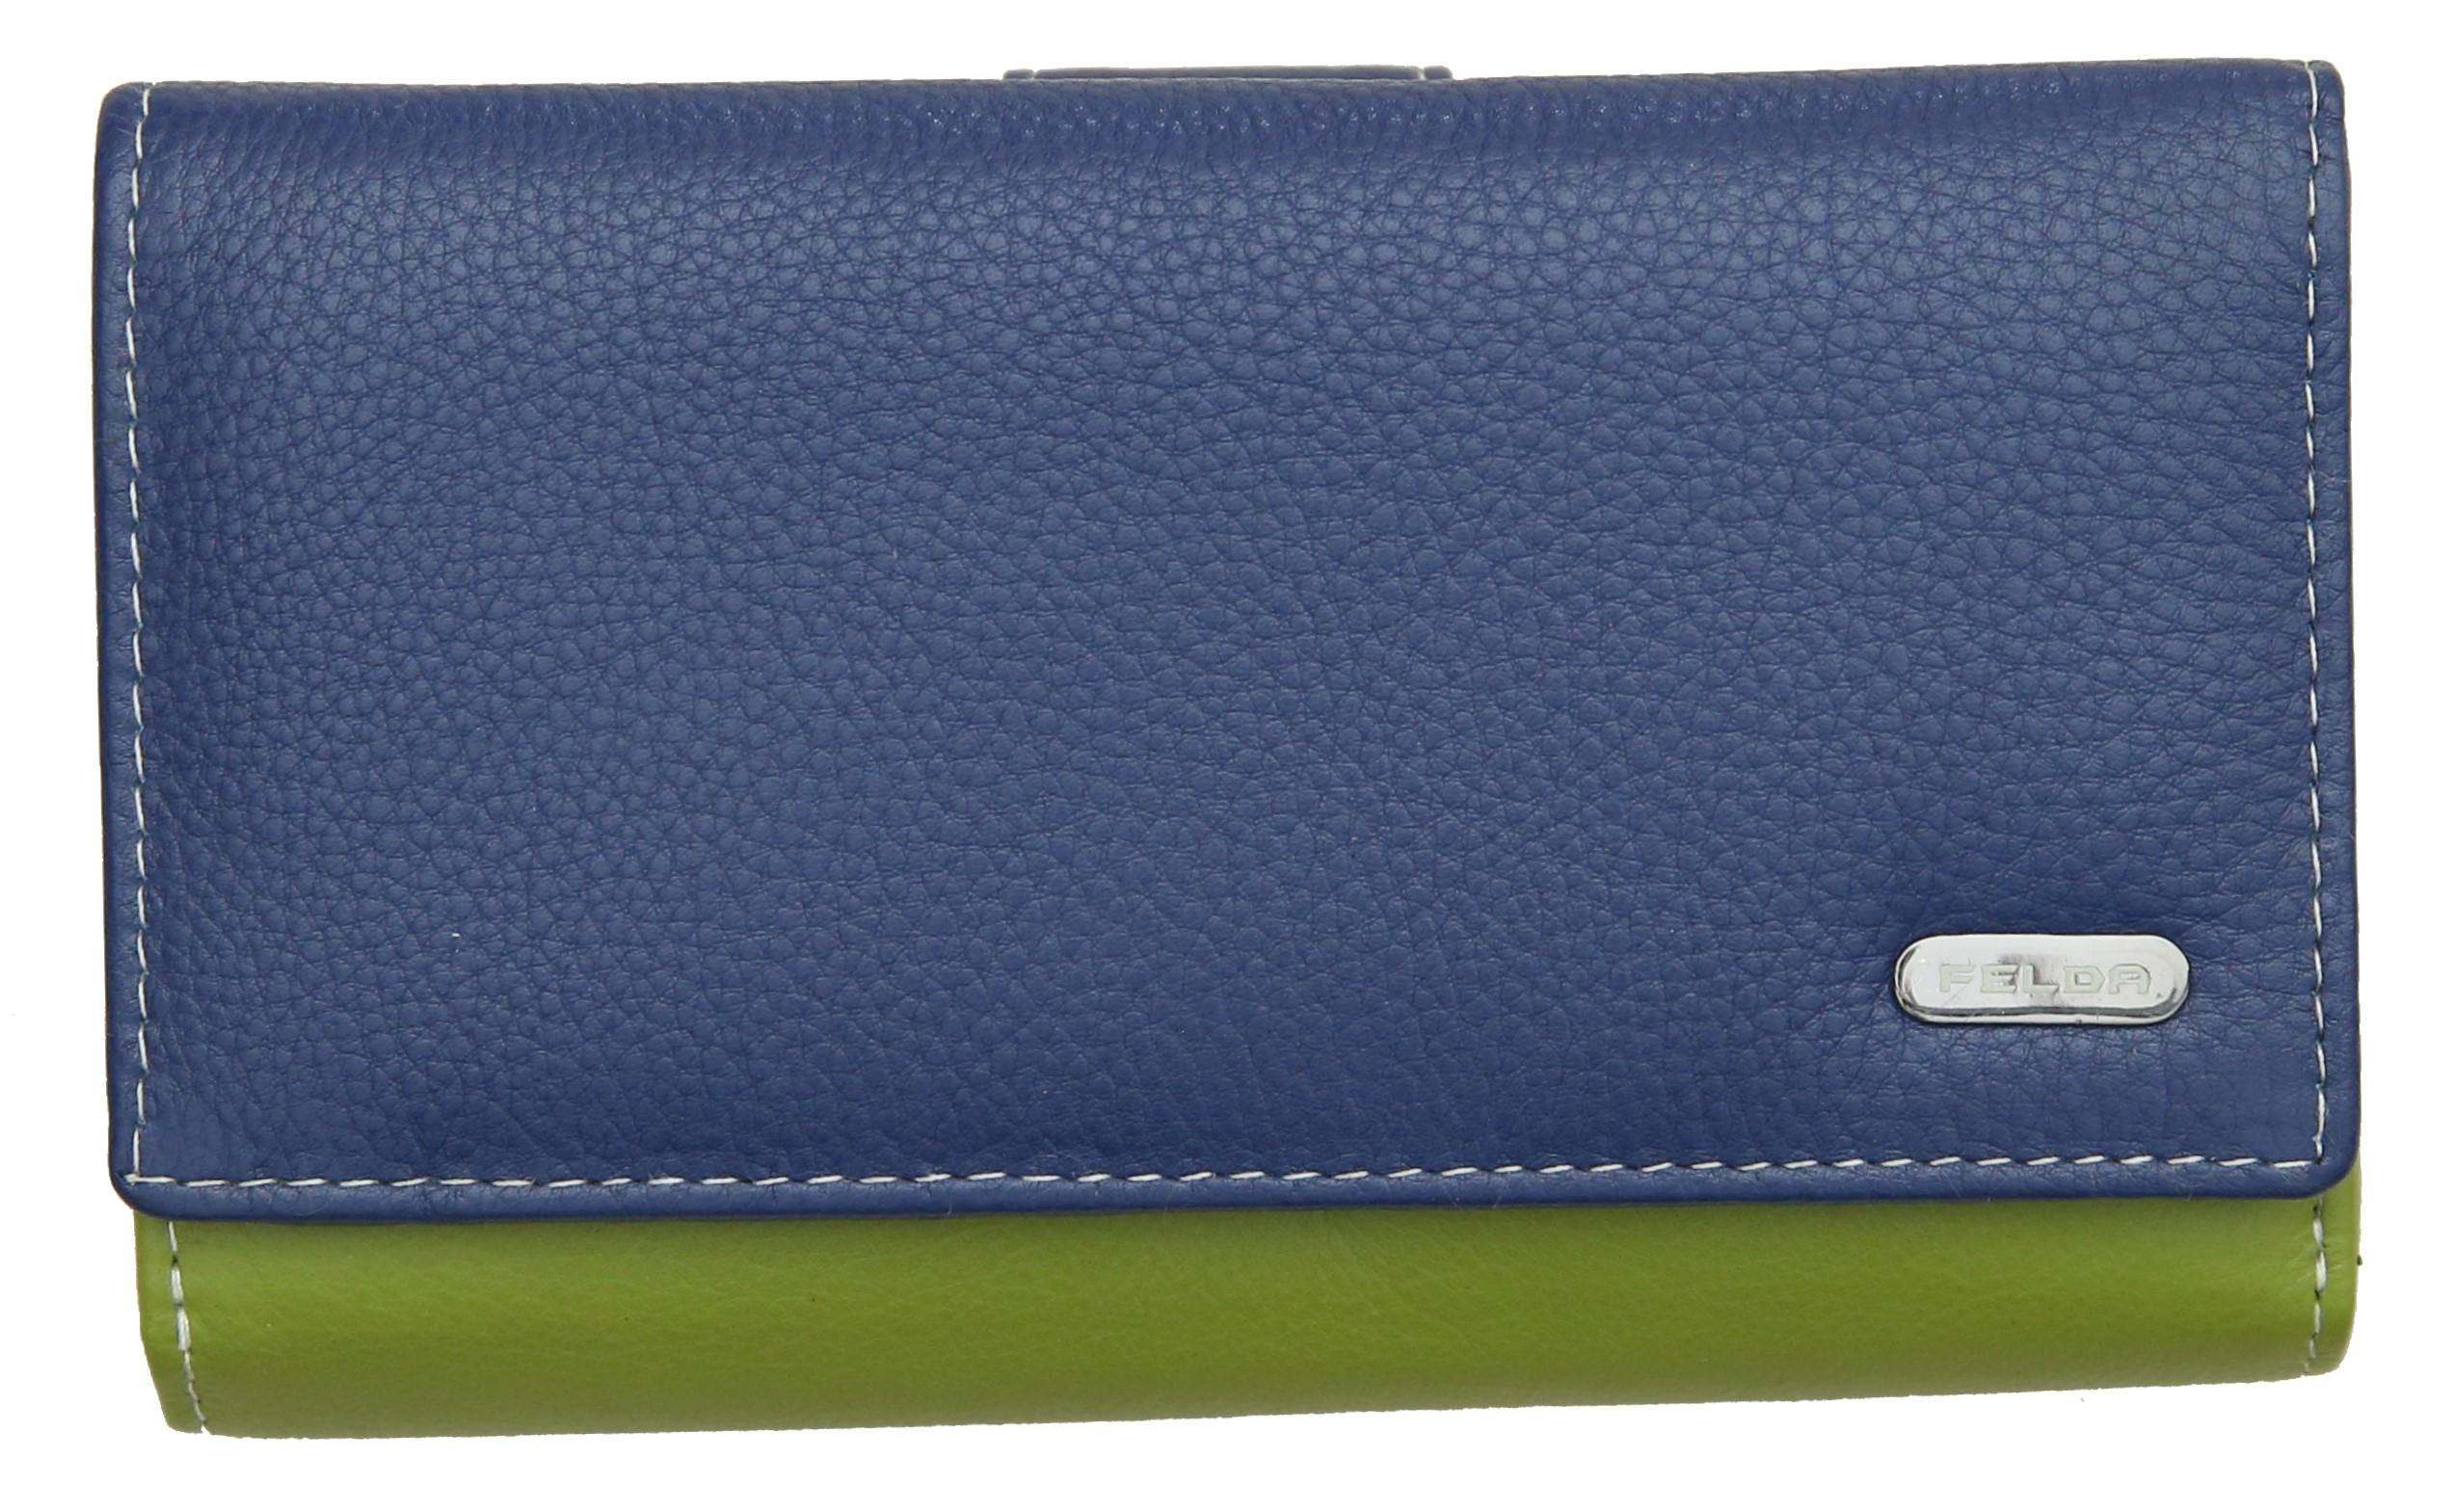 Felda-Portefeuille-pour-cartes-de-credit-cuir-souple-plusieurs-coloris miniature 7